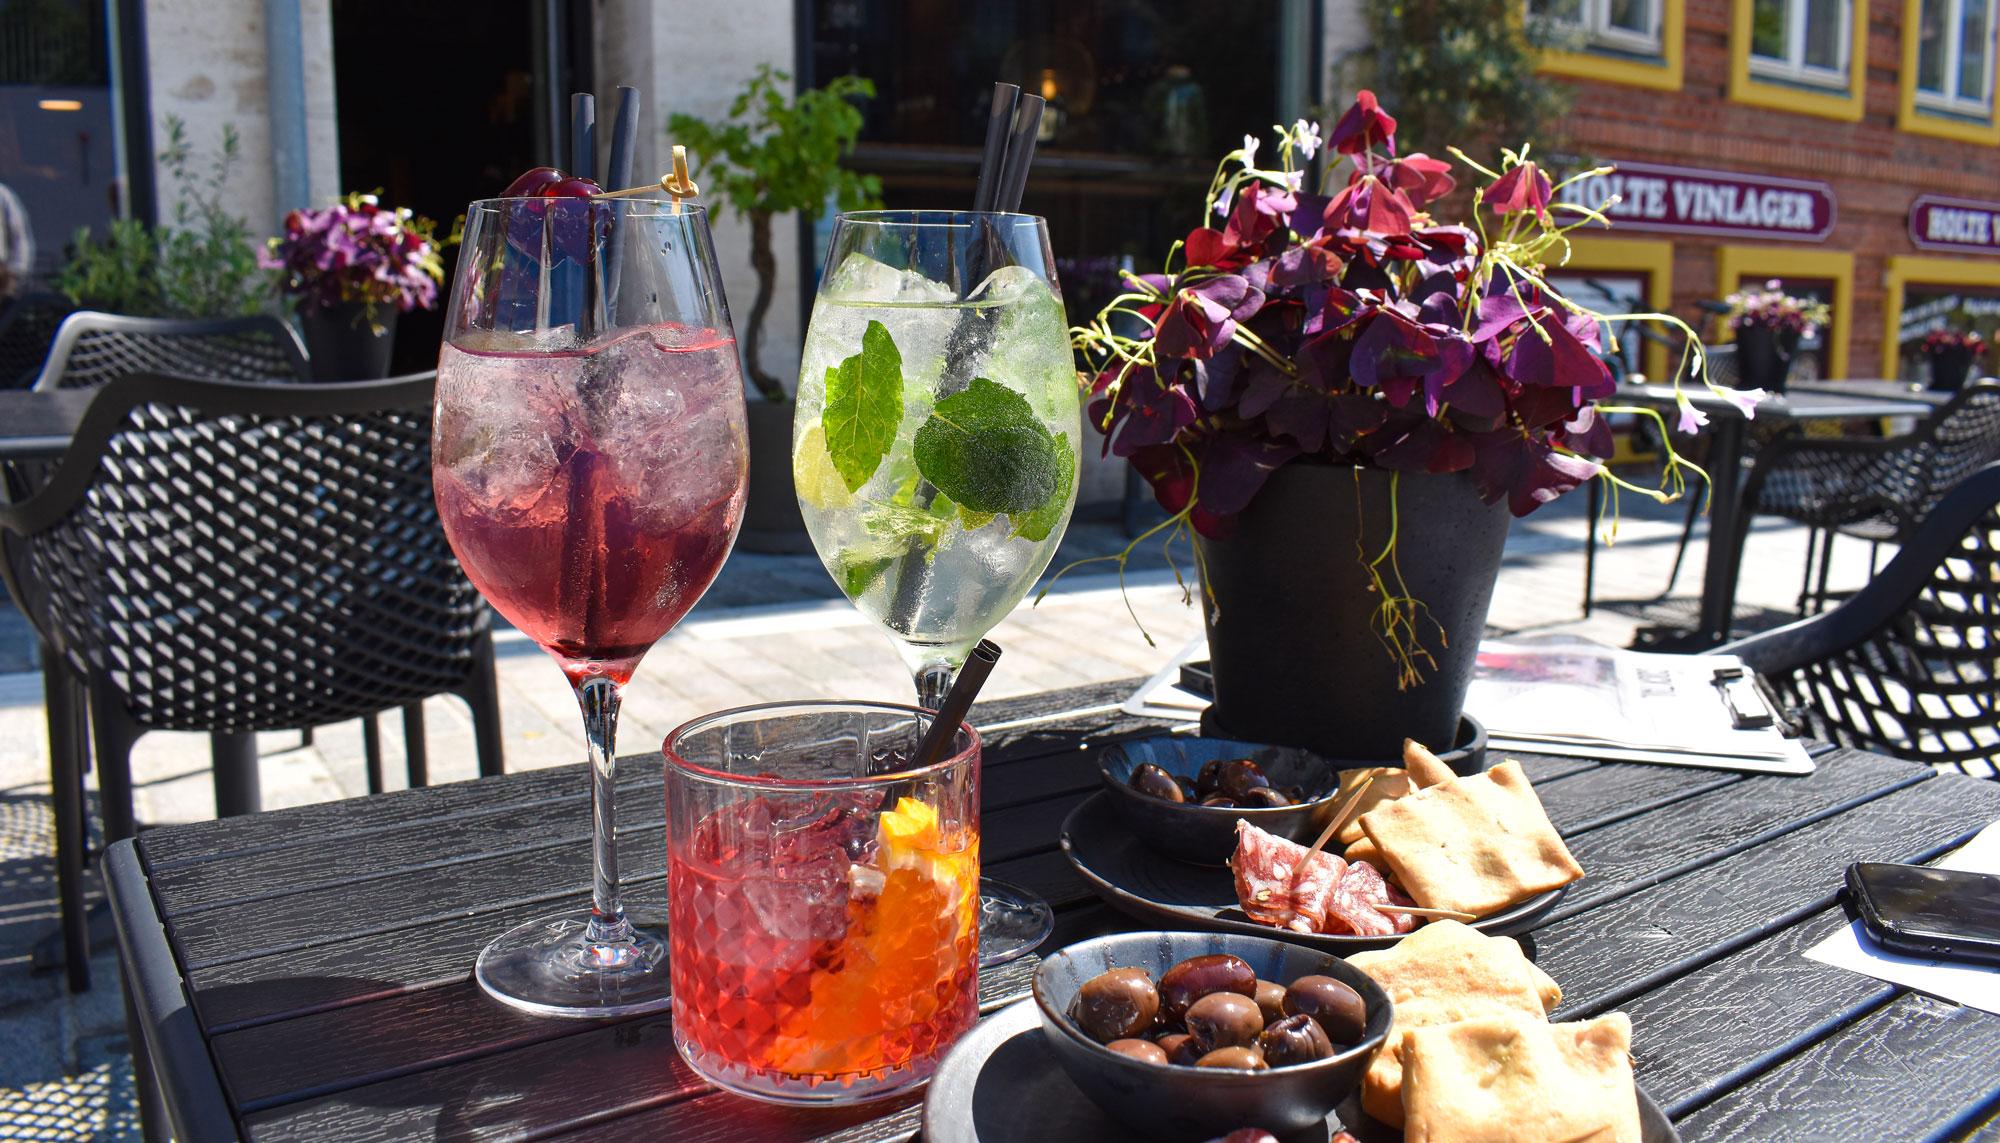 Italienske drinks til en skarp pris: Kom til fredagsbar hos Quist Wine